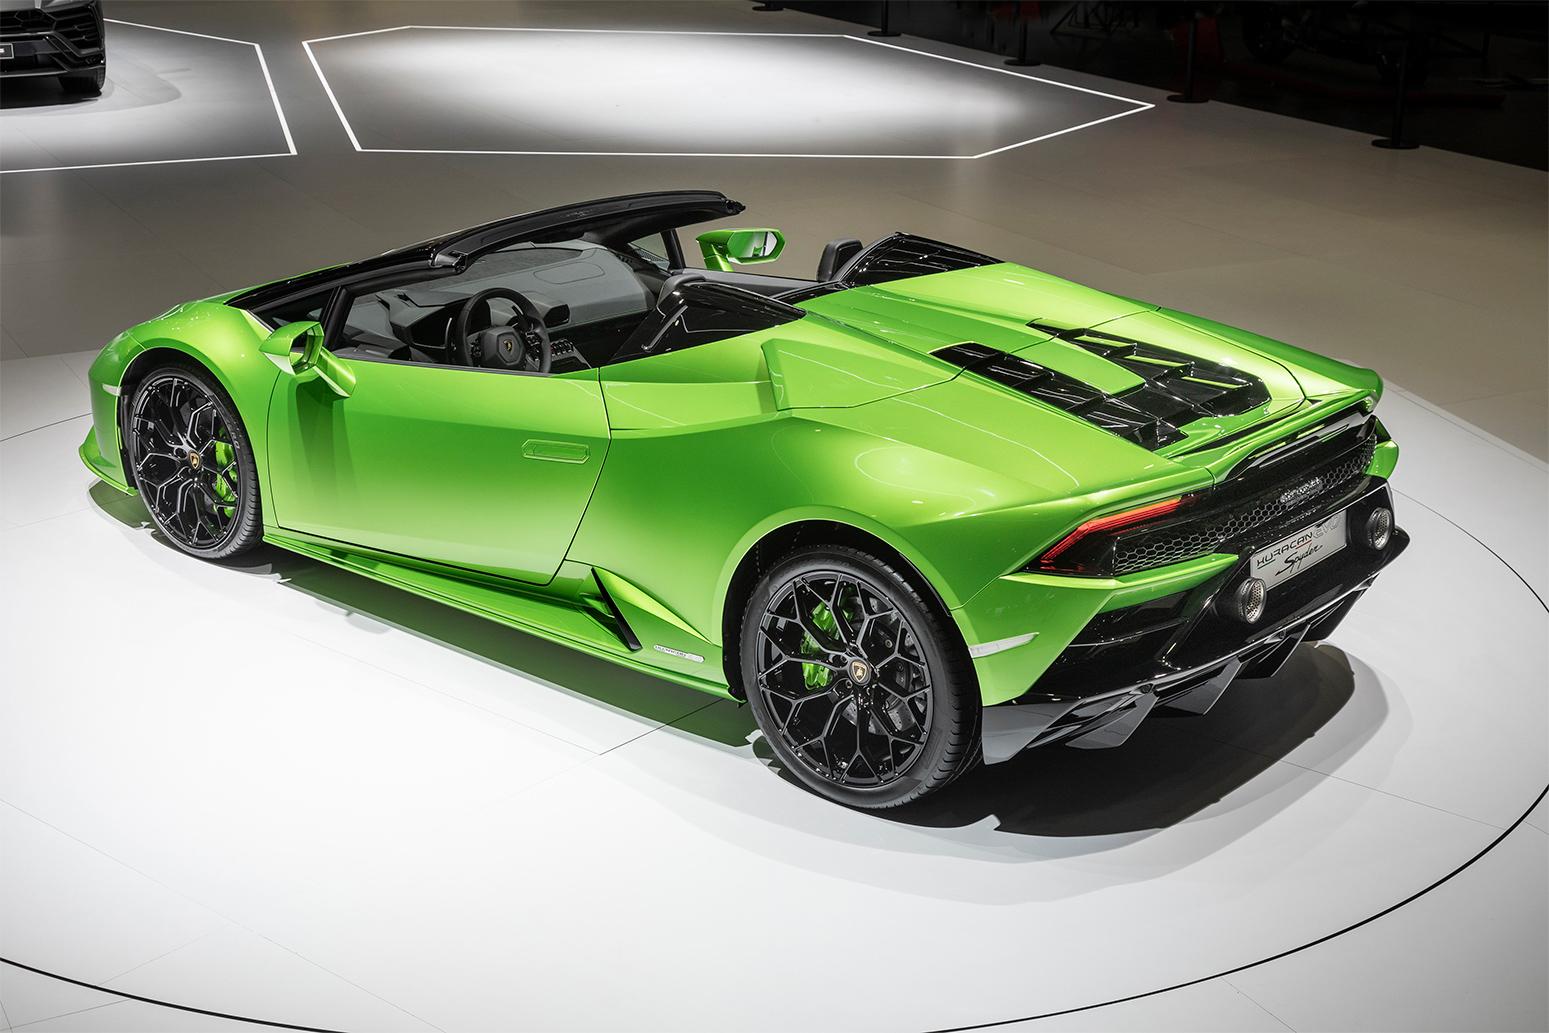 Lamborghini Huracan Evo Spyder And Aventador Svj Roadster Unveiled